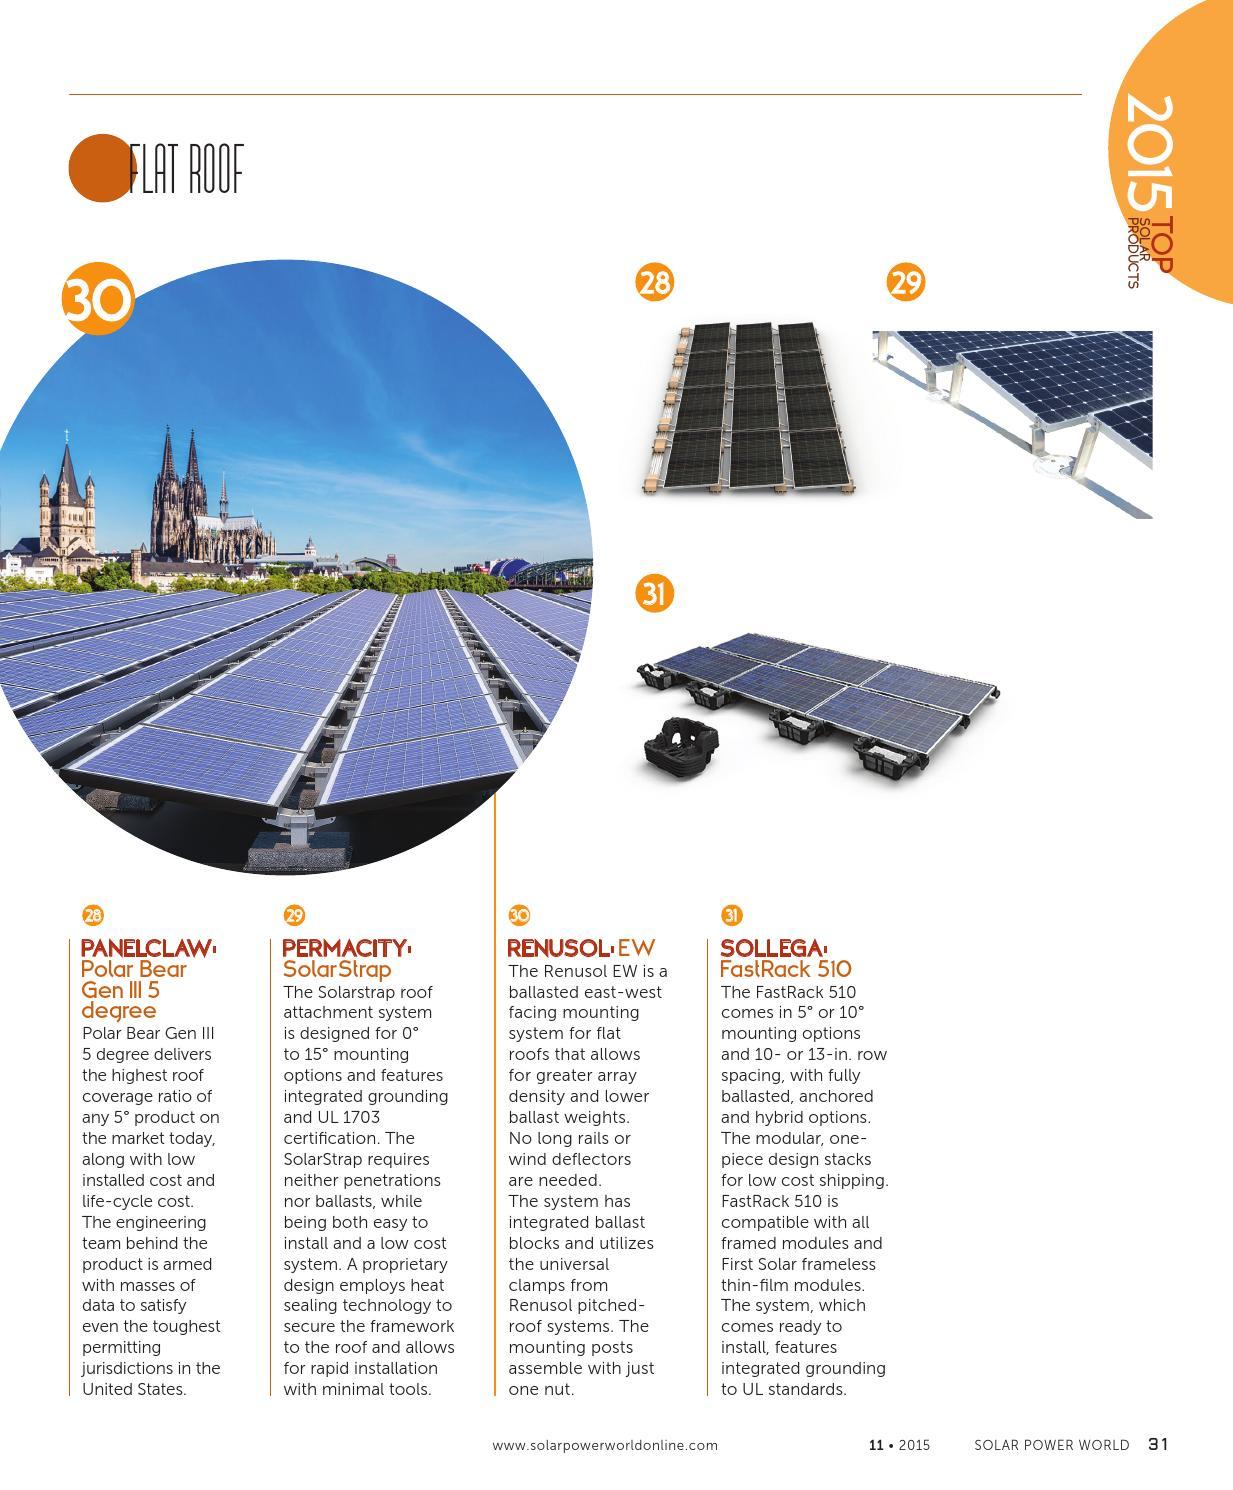 Solar Power World November 2015 By Wtwh Media Llc Issuu Panel Grounding Wiring Diagram